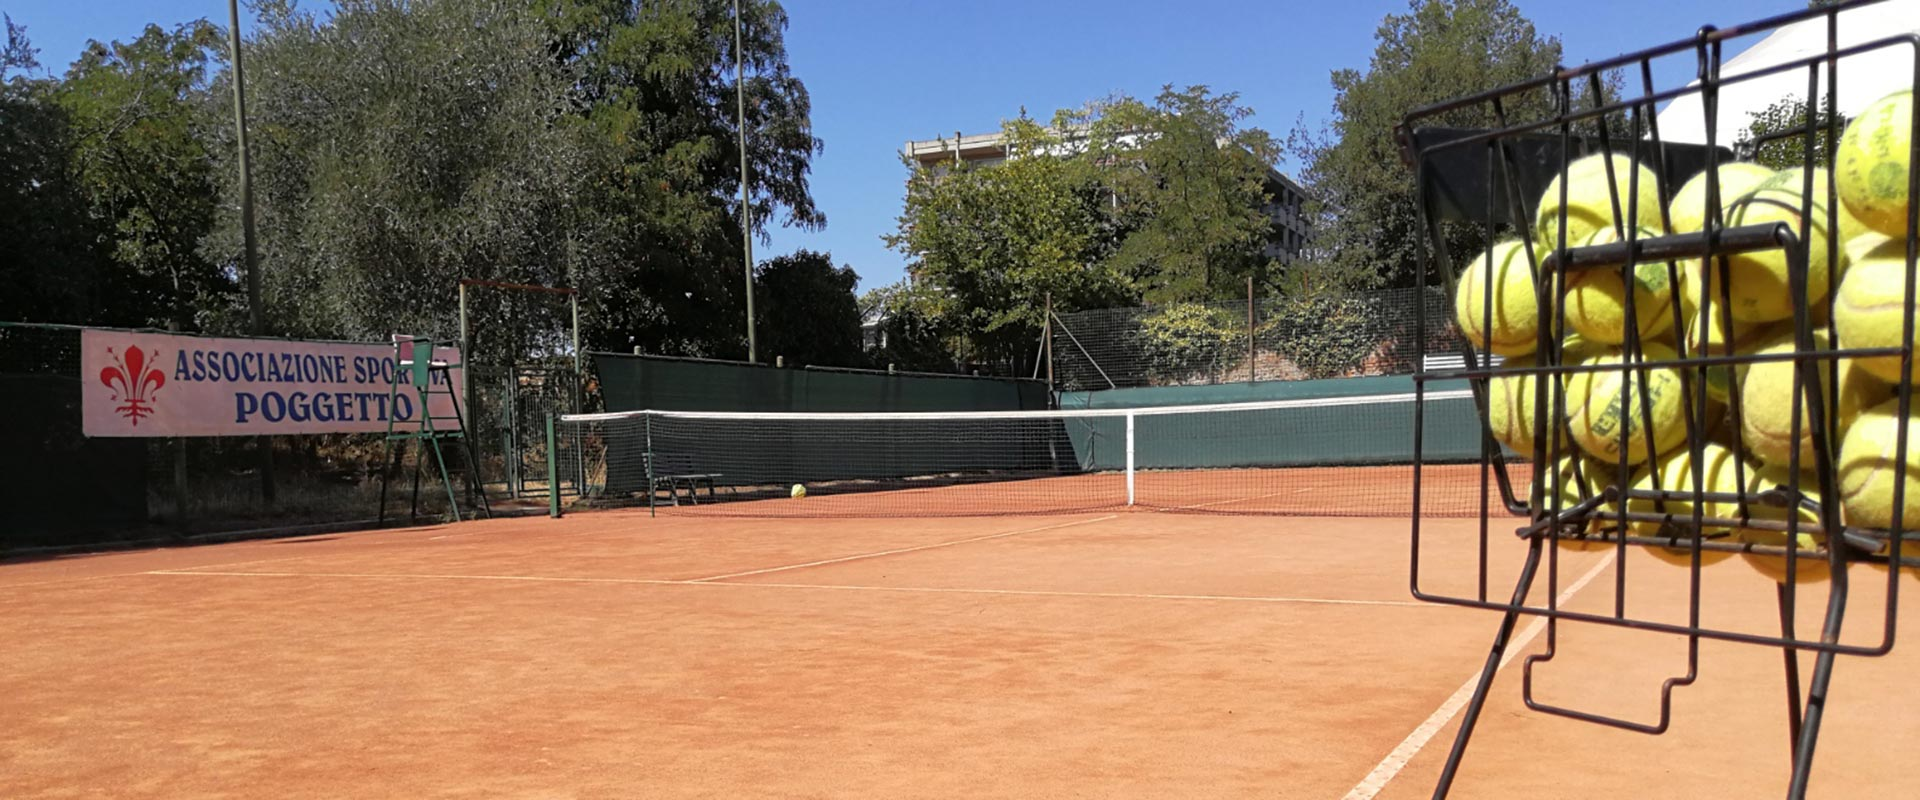 corsi tennis 2020